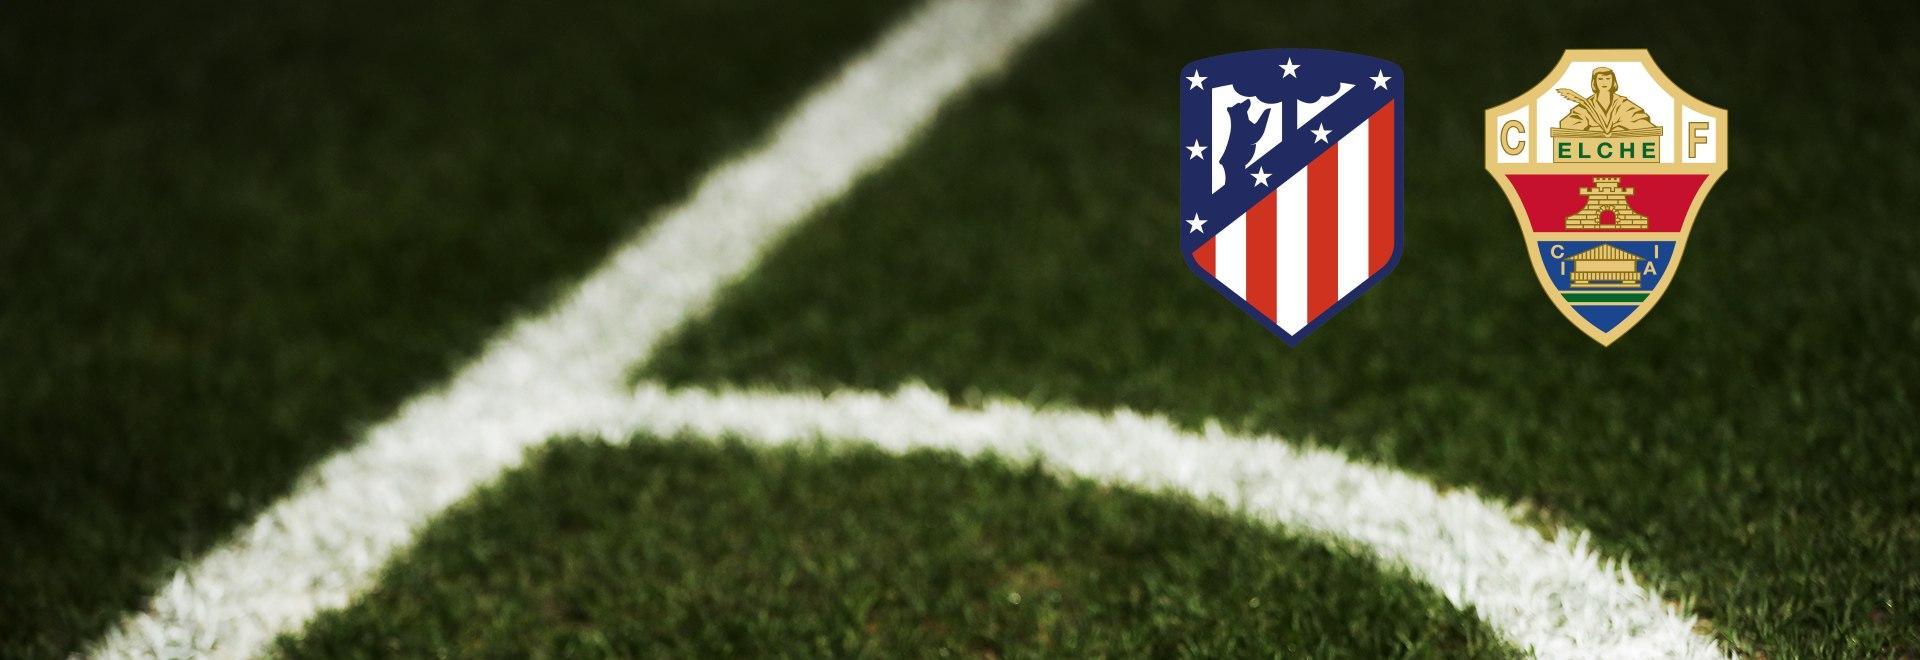 Atlético Madrid - Elche. 14a g.